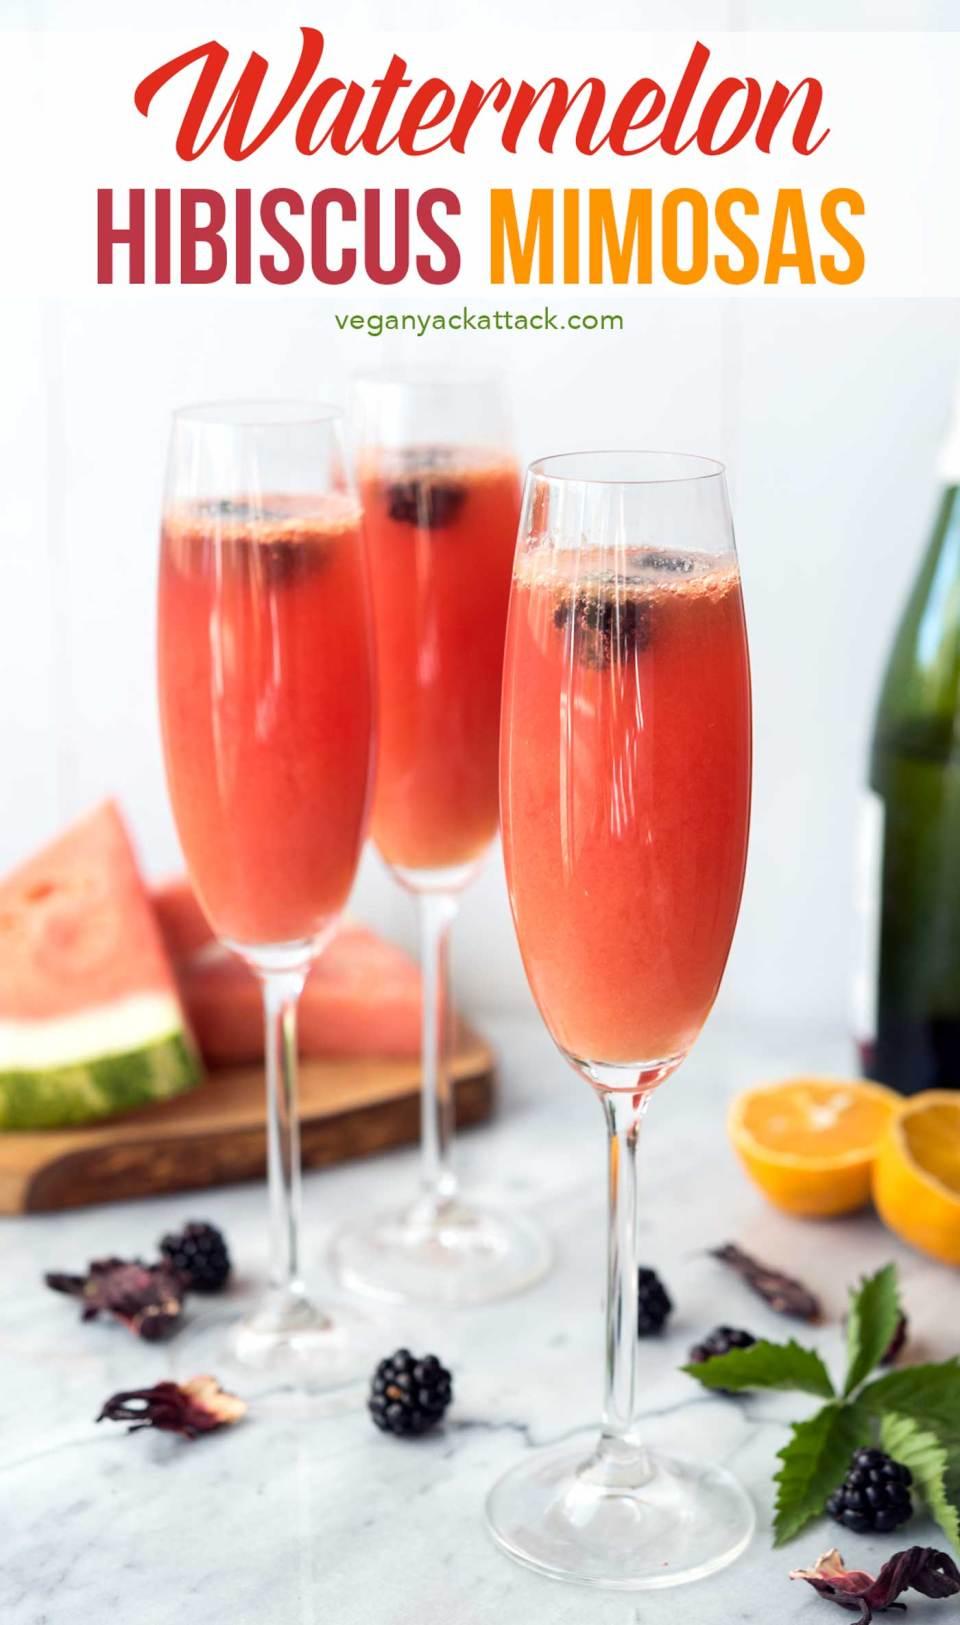 Refreshing watermelon, tart hibiscus tea, OJ and champagne make for the perfect, summer brunch beverage: Watermelon Hibiscus Mimosas! #vegan #allergenfriendly #brunch #drinks